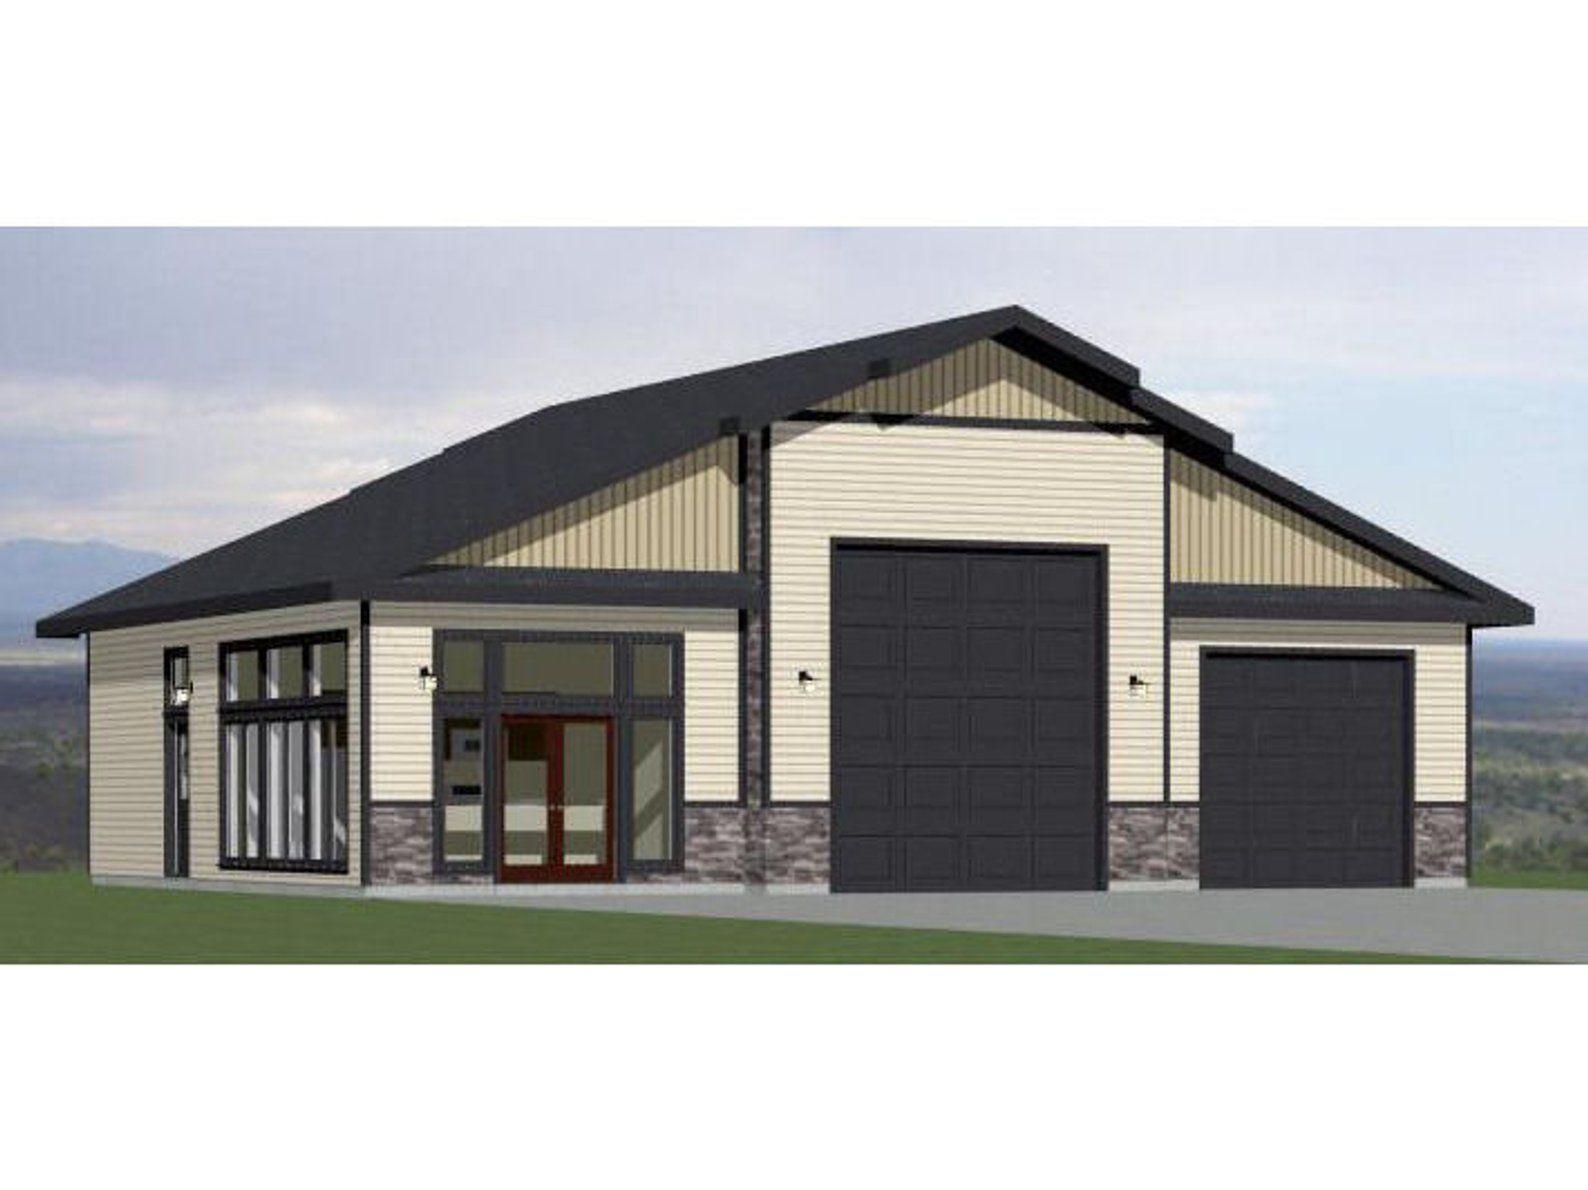 50x42 Garage 1 BR 1 BA PDF Floor Plan 1,973 sq ft